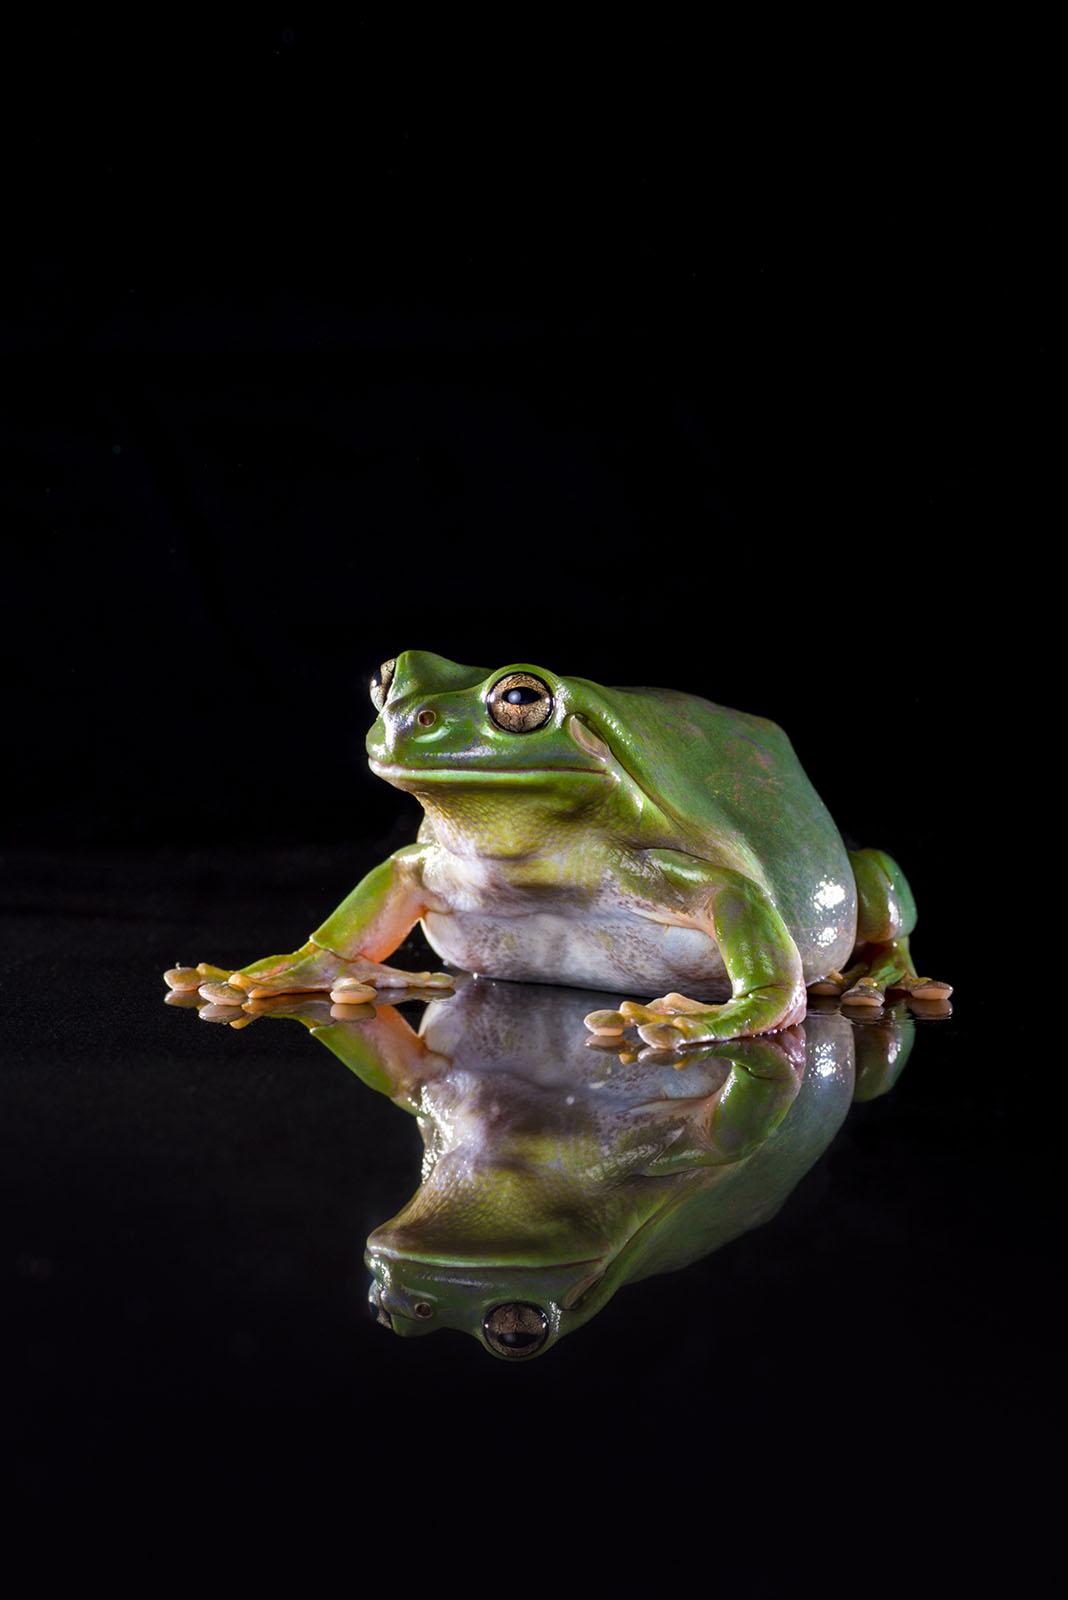 Oslo the Green Tree Frog